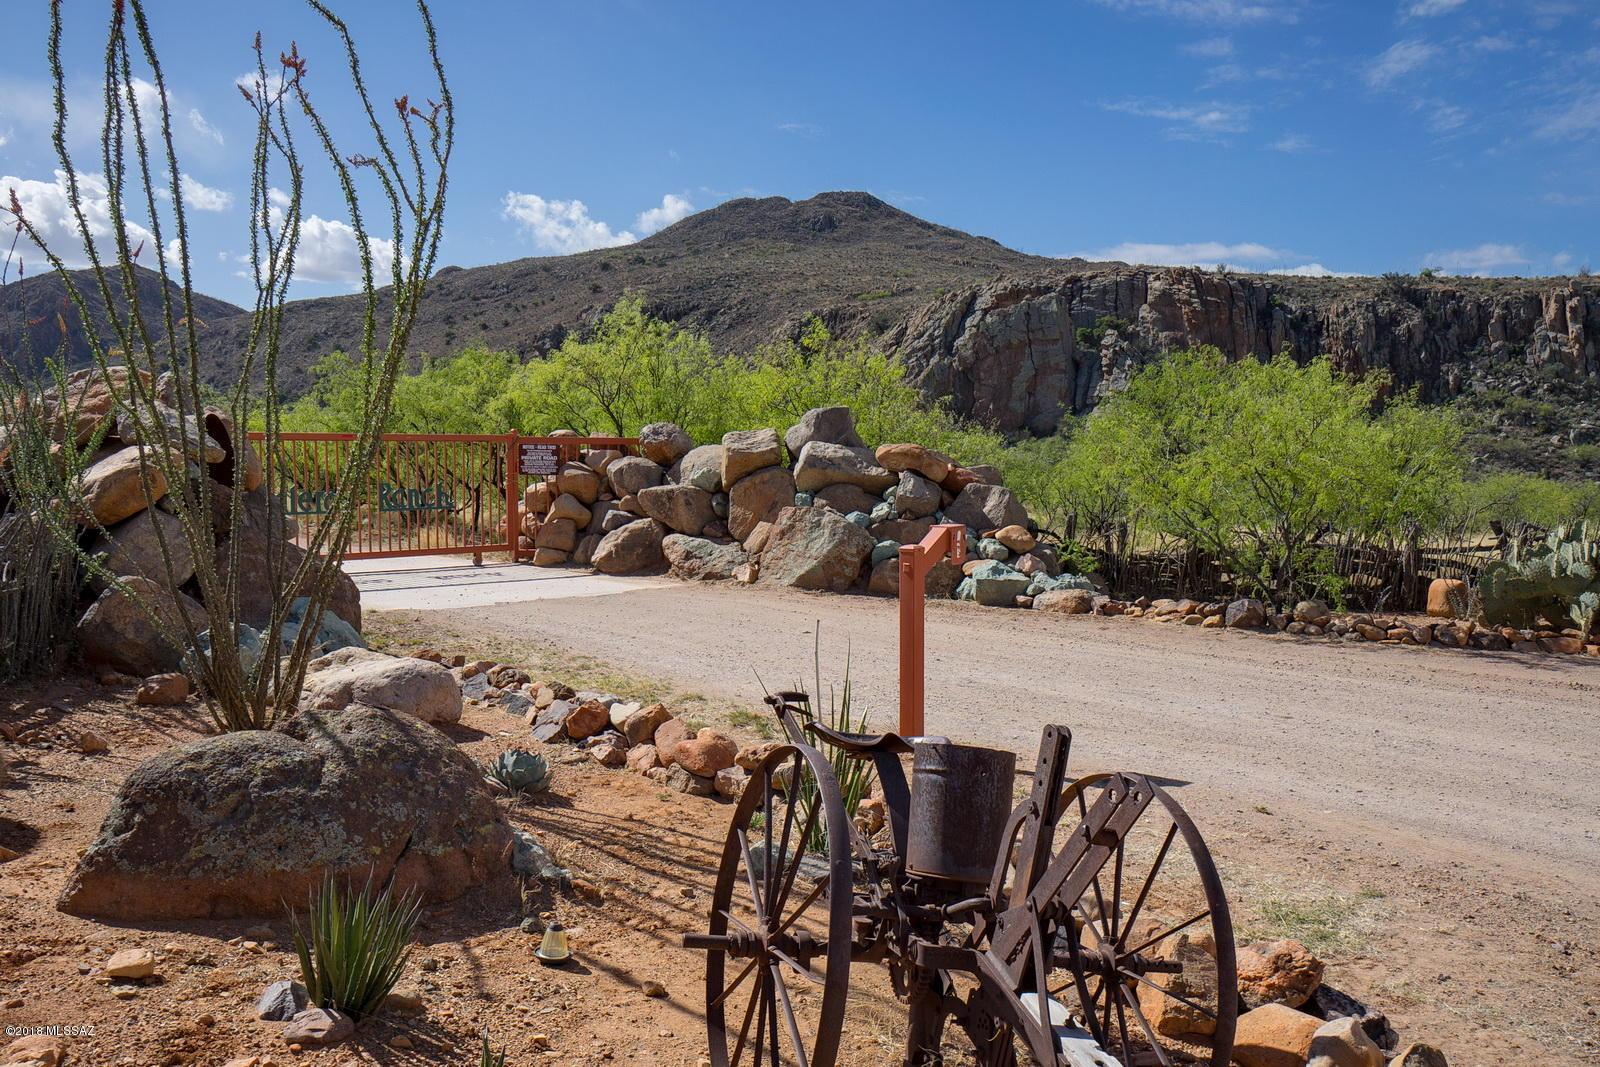 Unit 116, Tbd Salero Mountain Drive, Tubac AZ 85646 - Photo 1